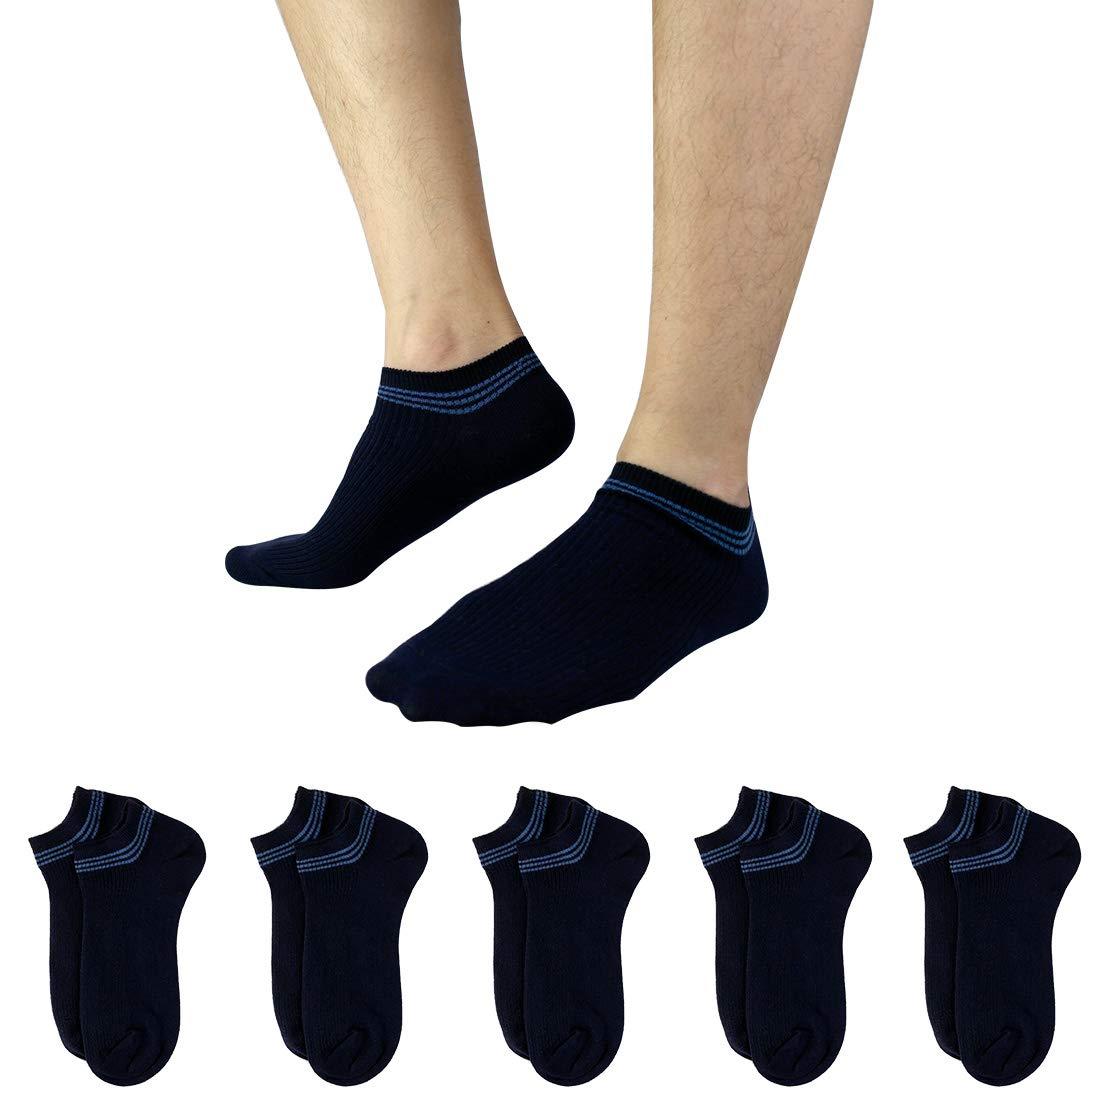 Dockers Mens Dockers 5 Pack Cushion Comfort Sport Crew Socks